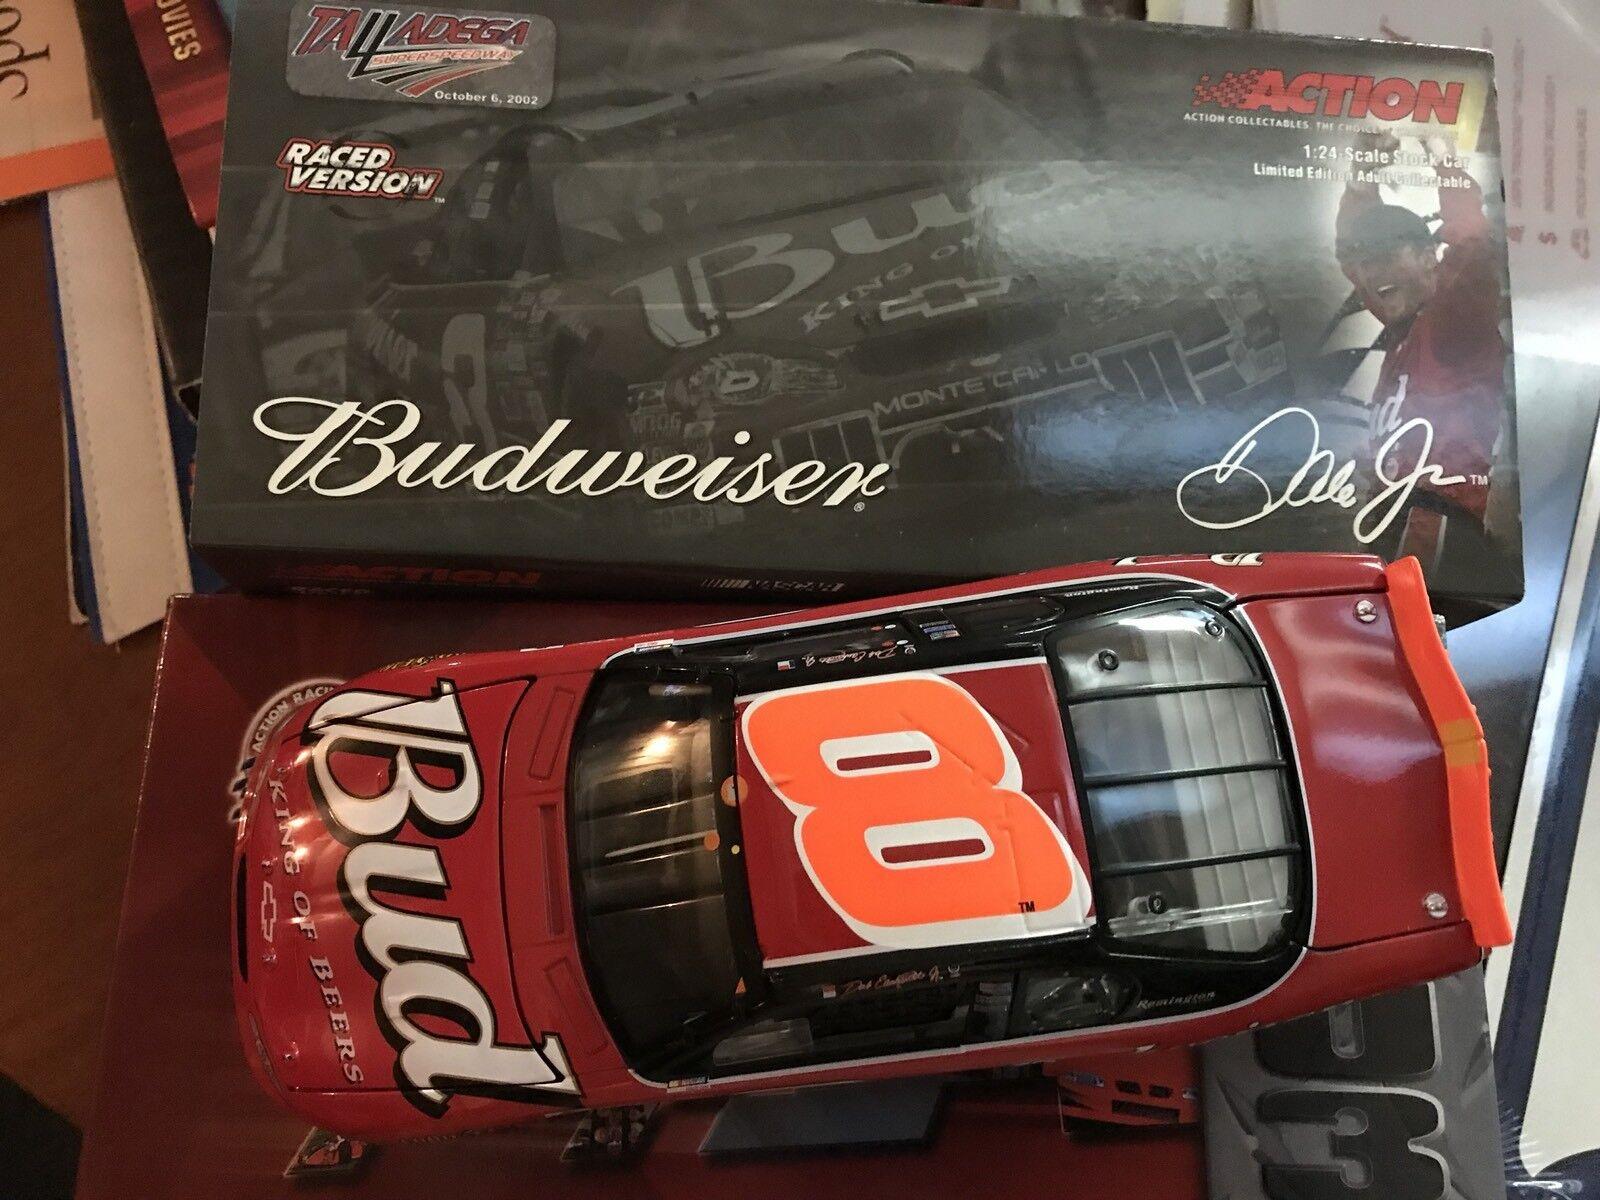 2002 DALE EARNHARDT EARNHARDT EARNHARDT JR 1 24 Budweiser sizeDEGA WIN 3RD Win Rare orange 018742